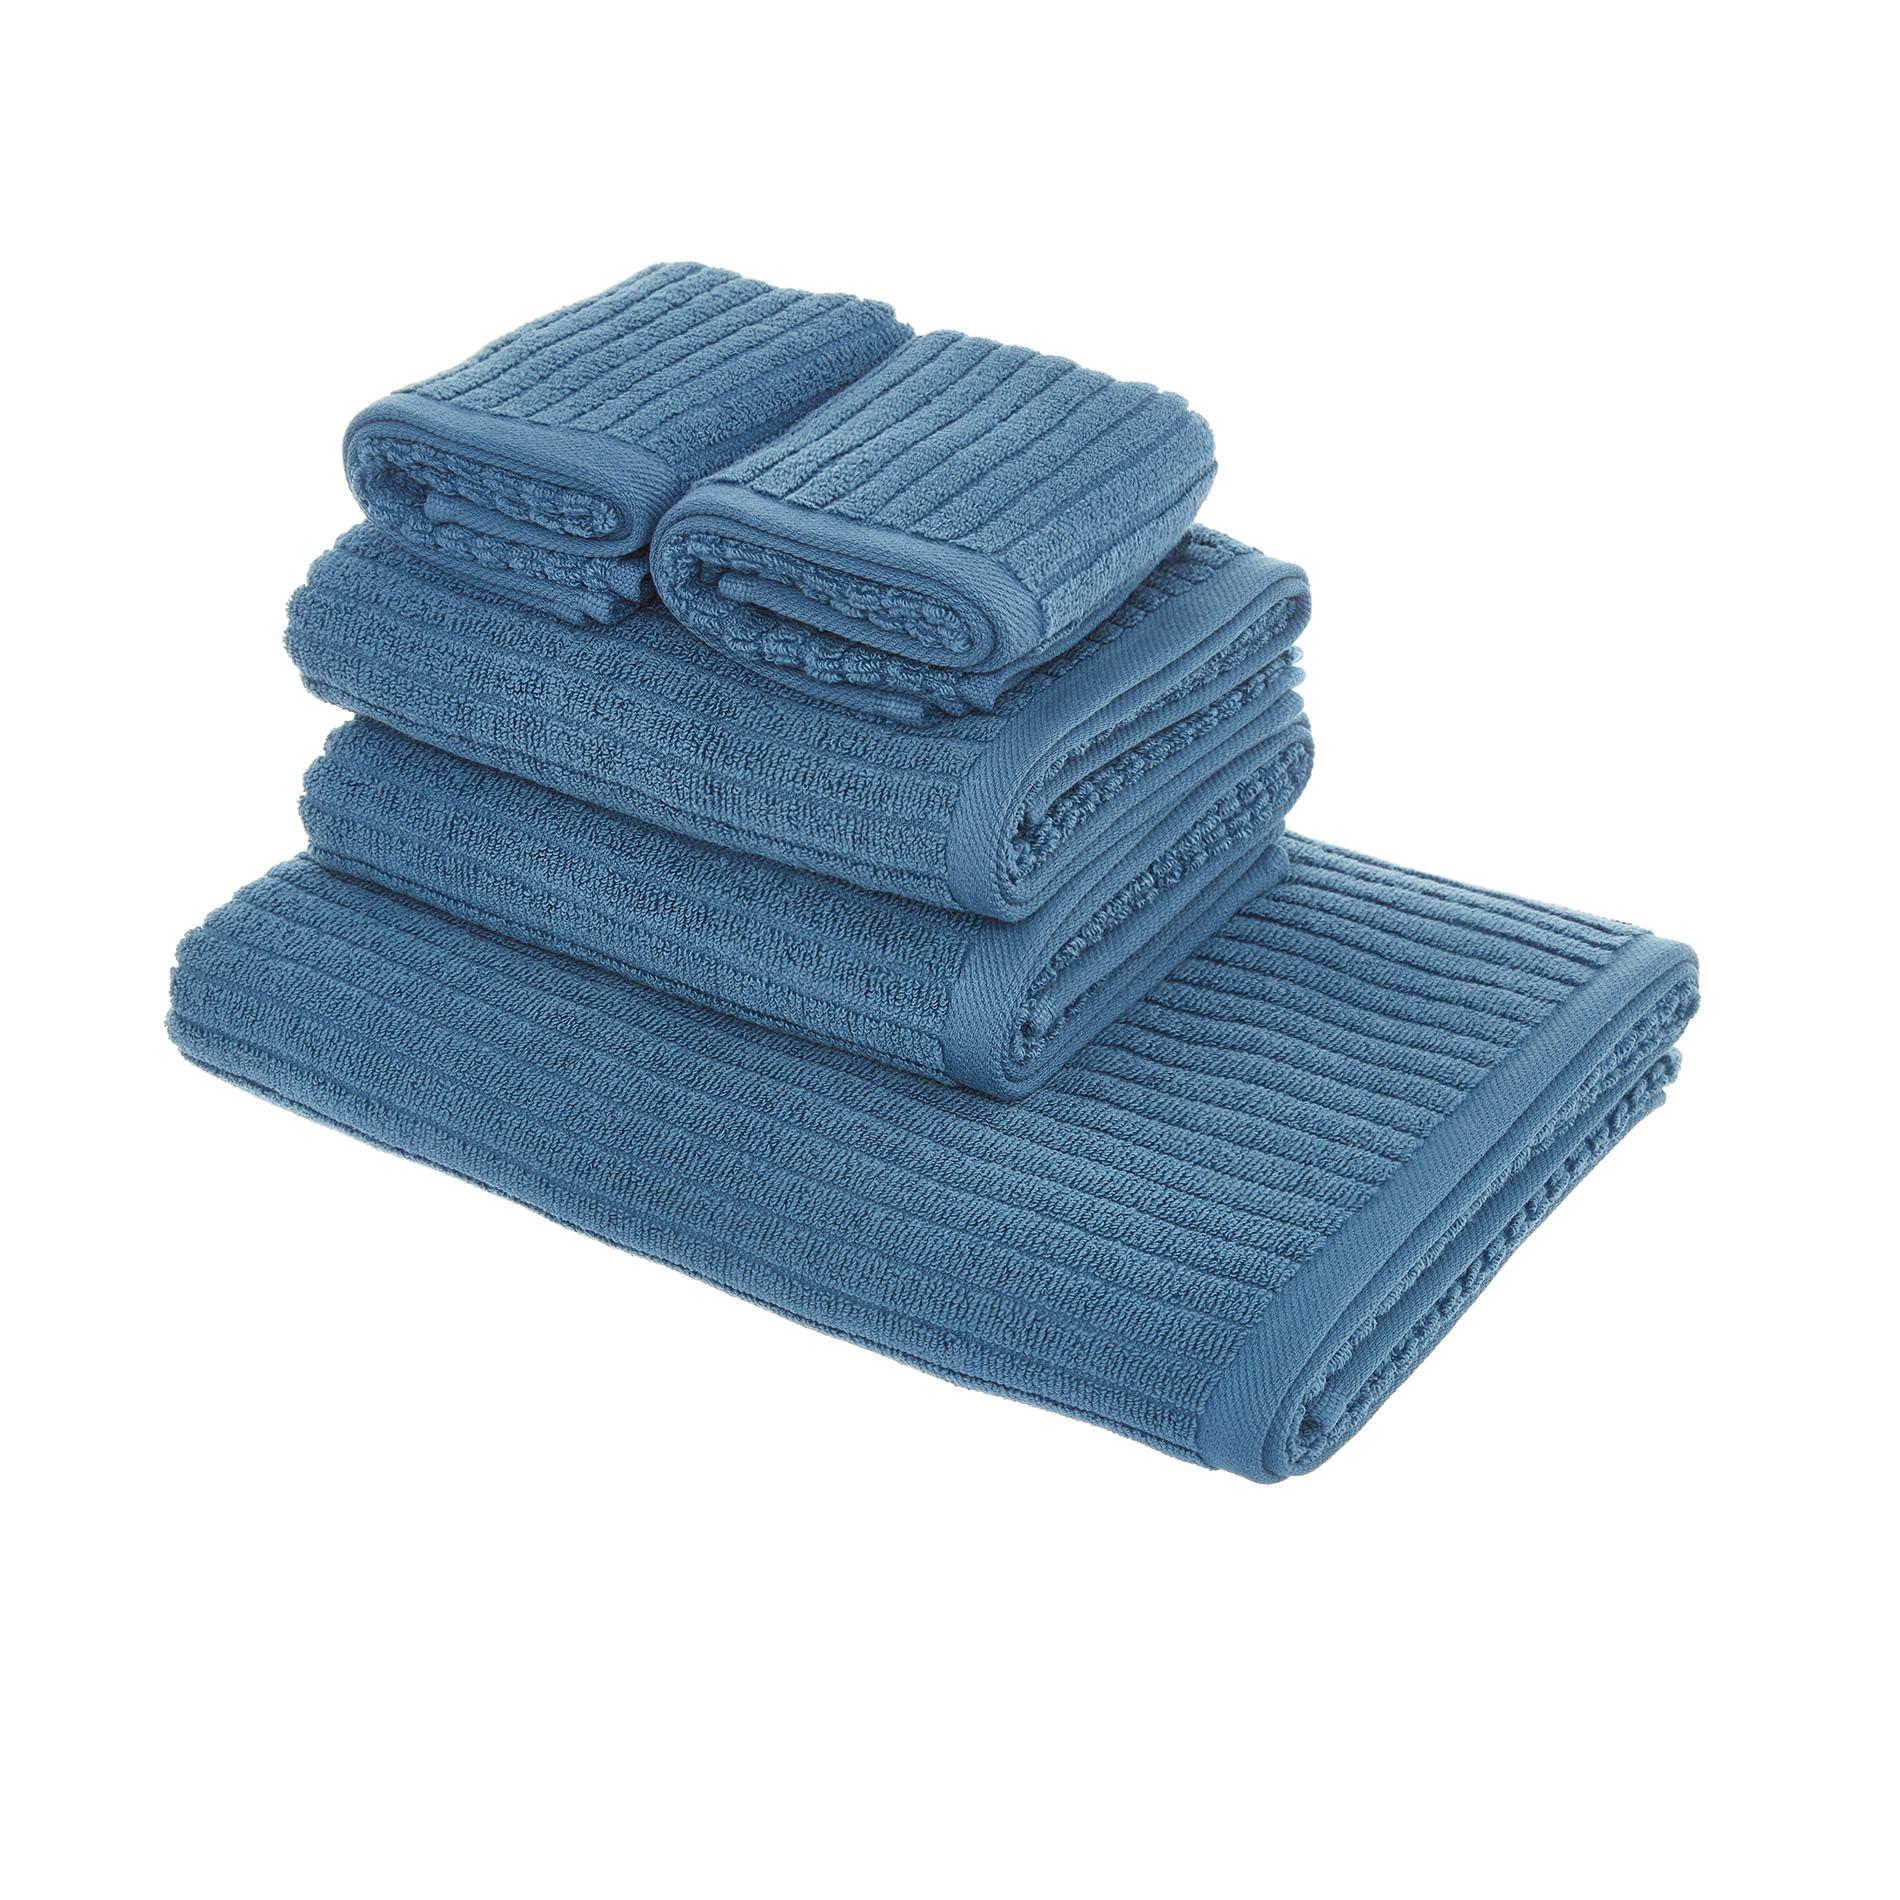 Set asciugamani puro cotone righe jacquard tinta unita, Blu, large image number 1